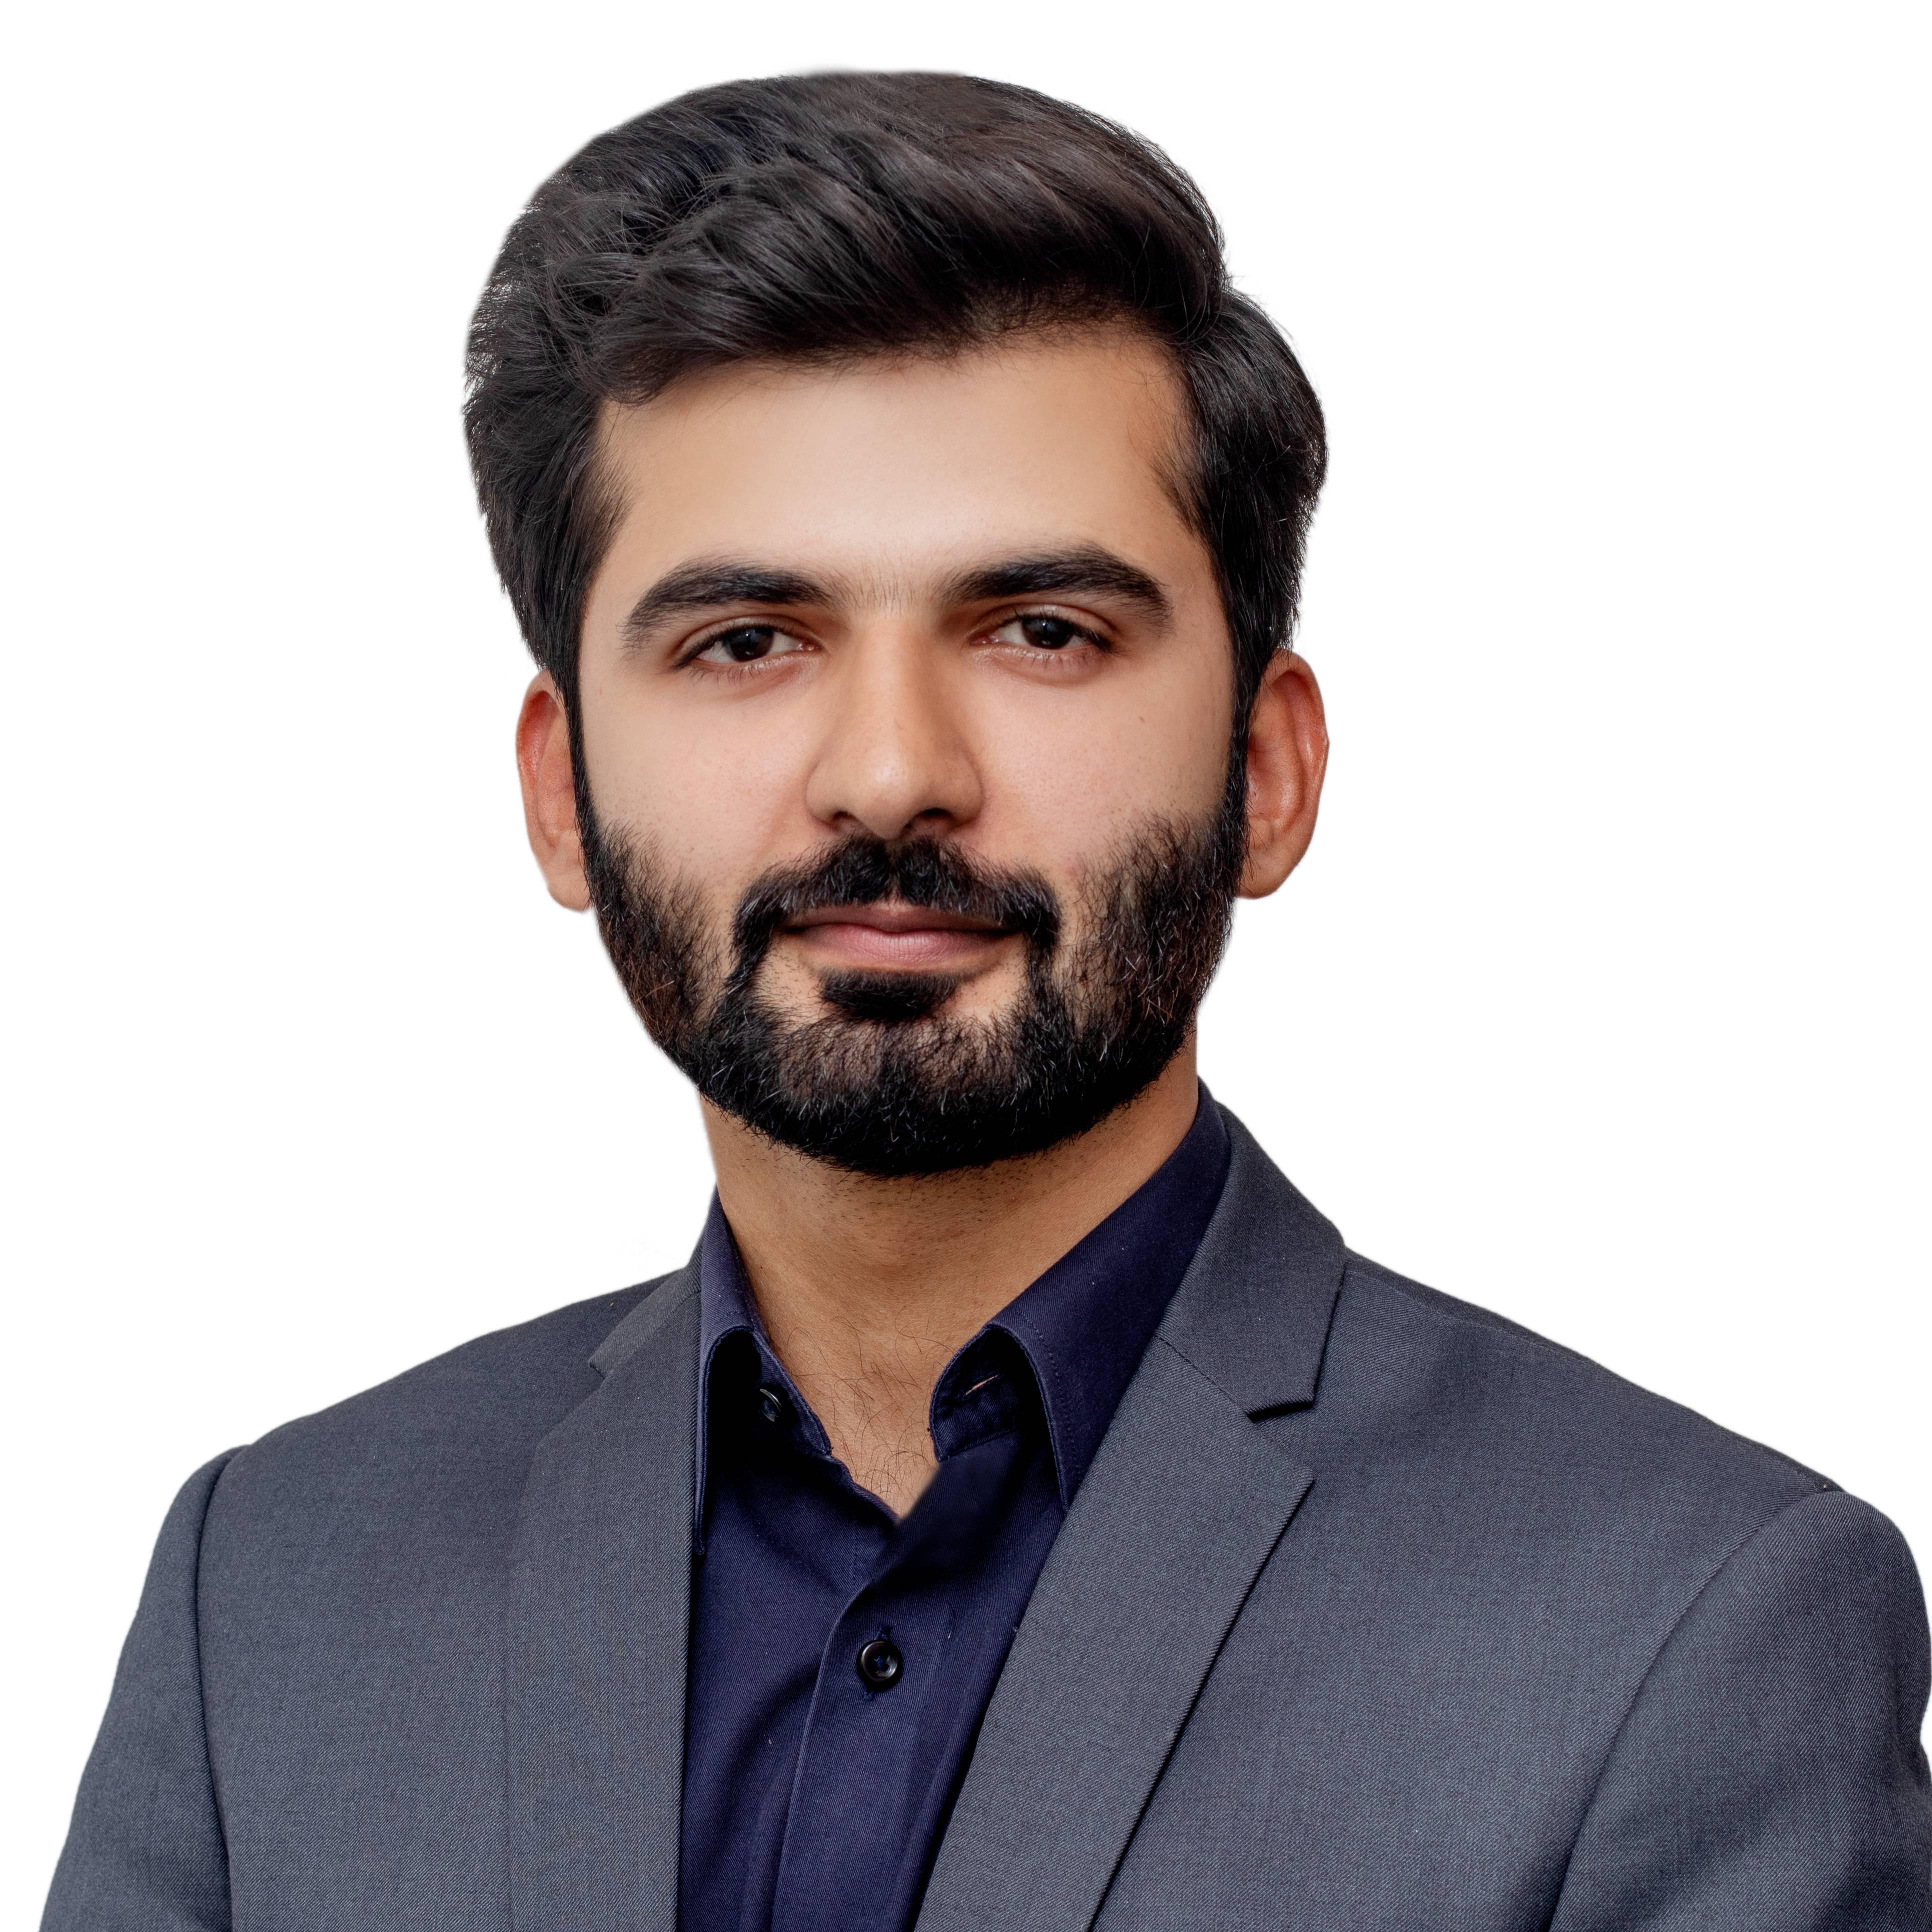 Muhammad Shahzaib